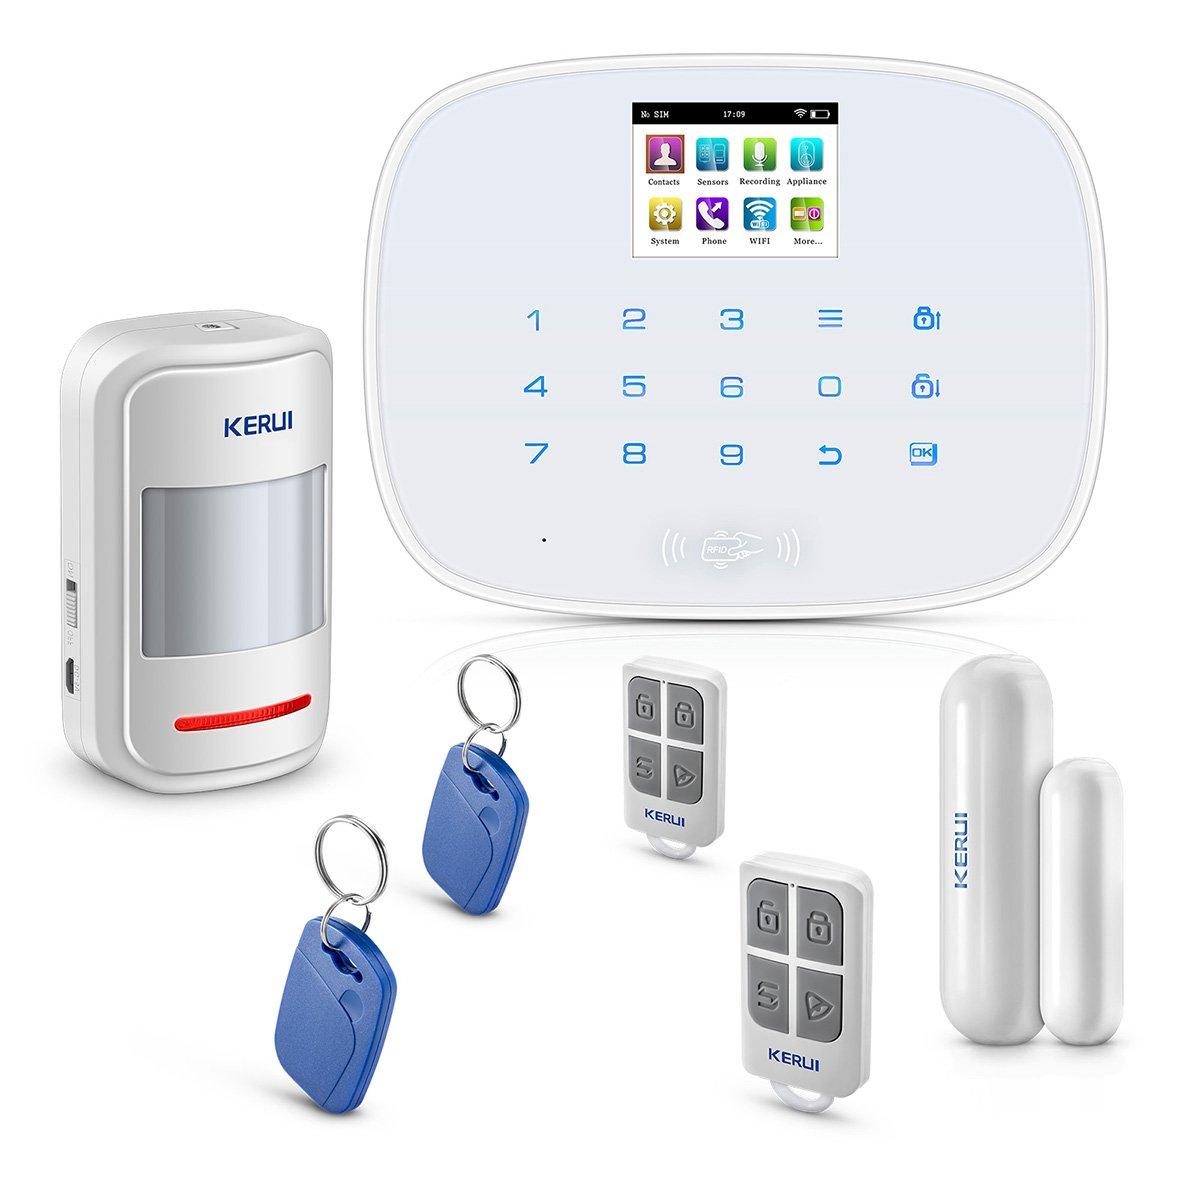 KERUI Wireless Home/House Business Security Alarm System,3G WIFI PSTN Auto Dial APP Remote Control Smart Burglar Alert DIY Kit ,W193 come with Door Contact Sensor and PIR Motion Sensor